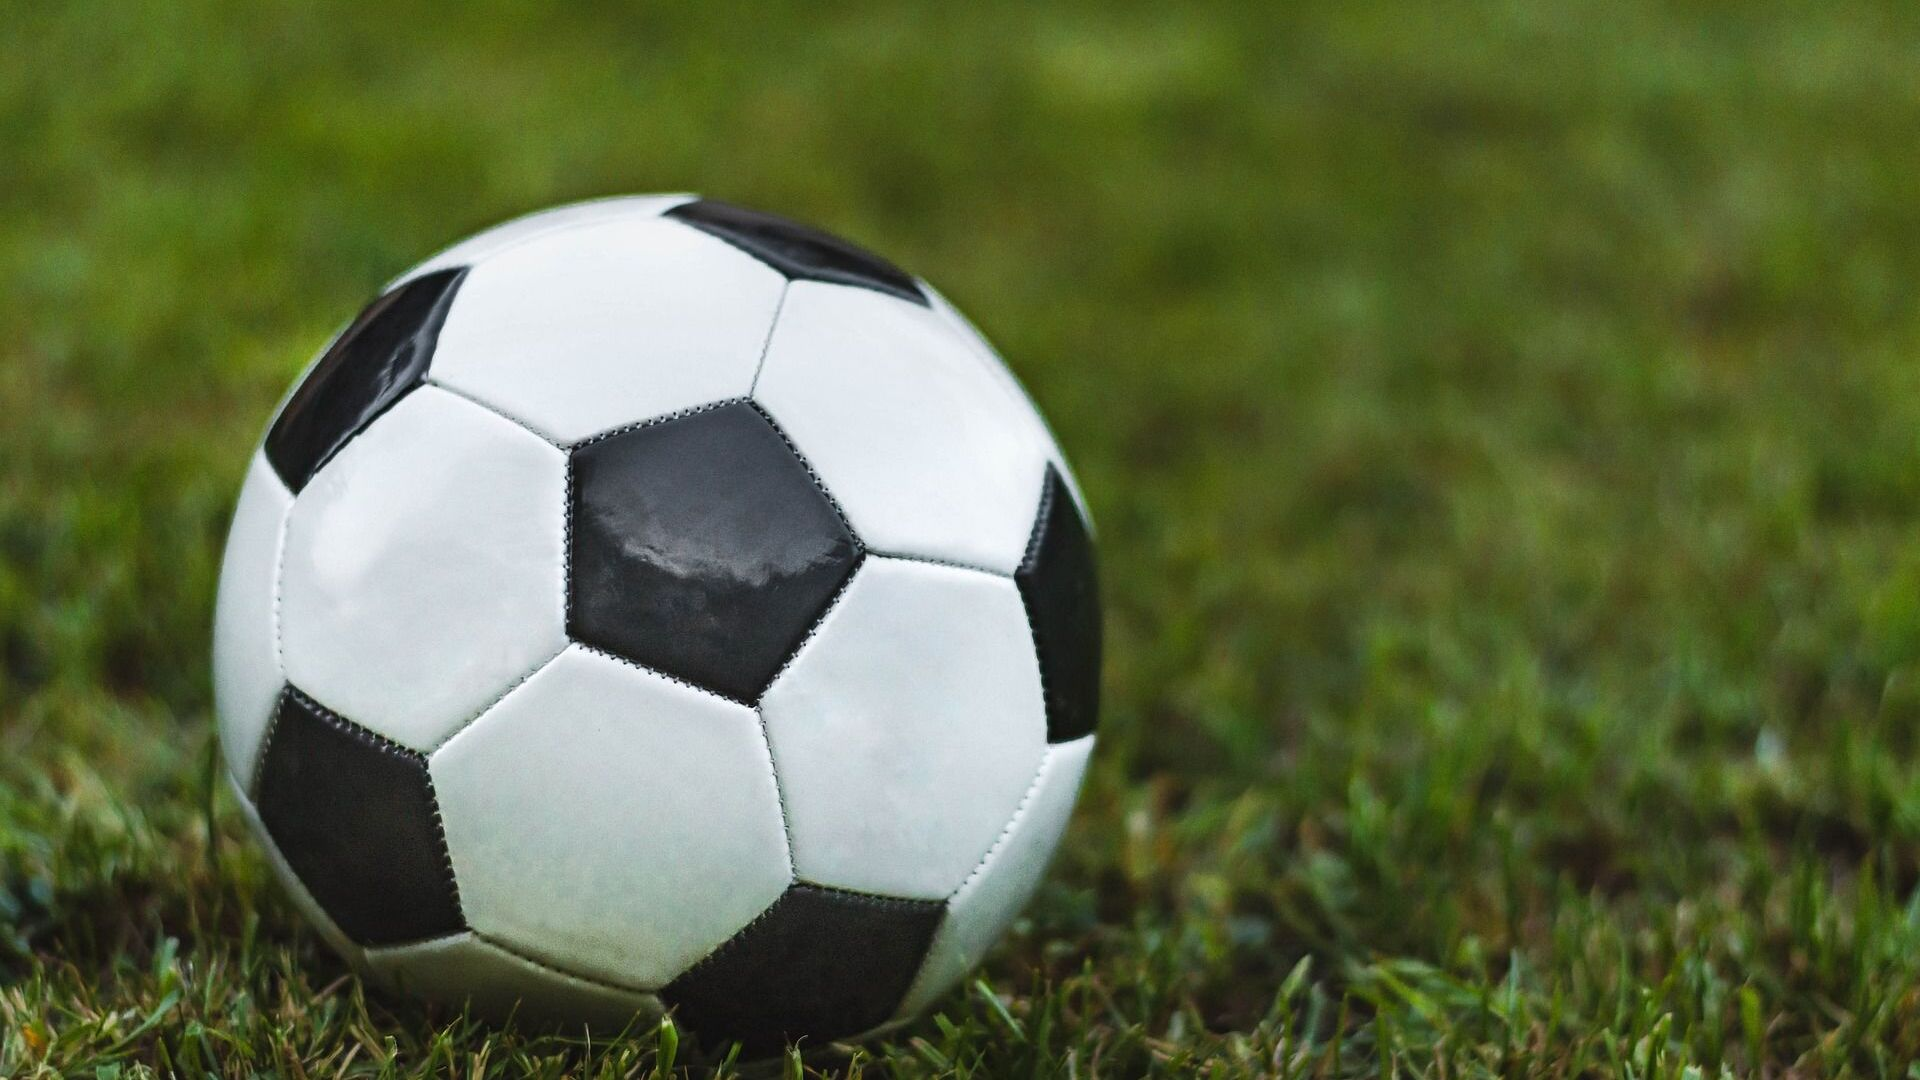 Football ball  - Sputnik International, 1920, 03.05.2021